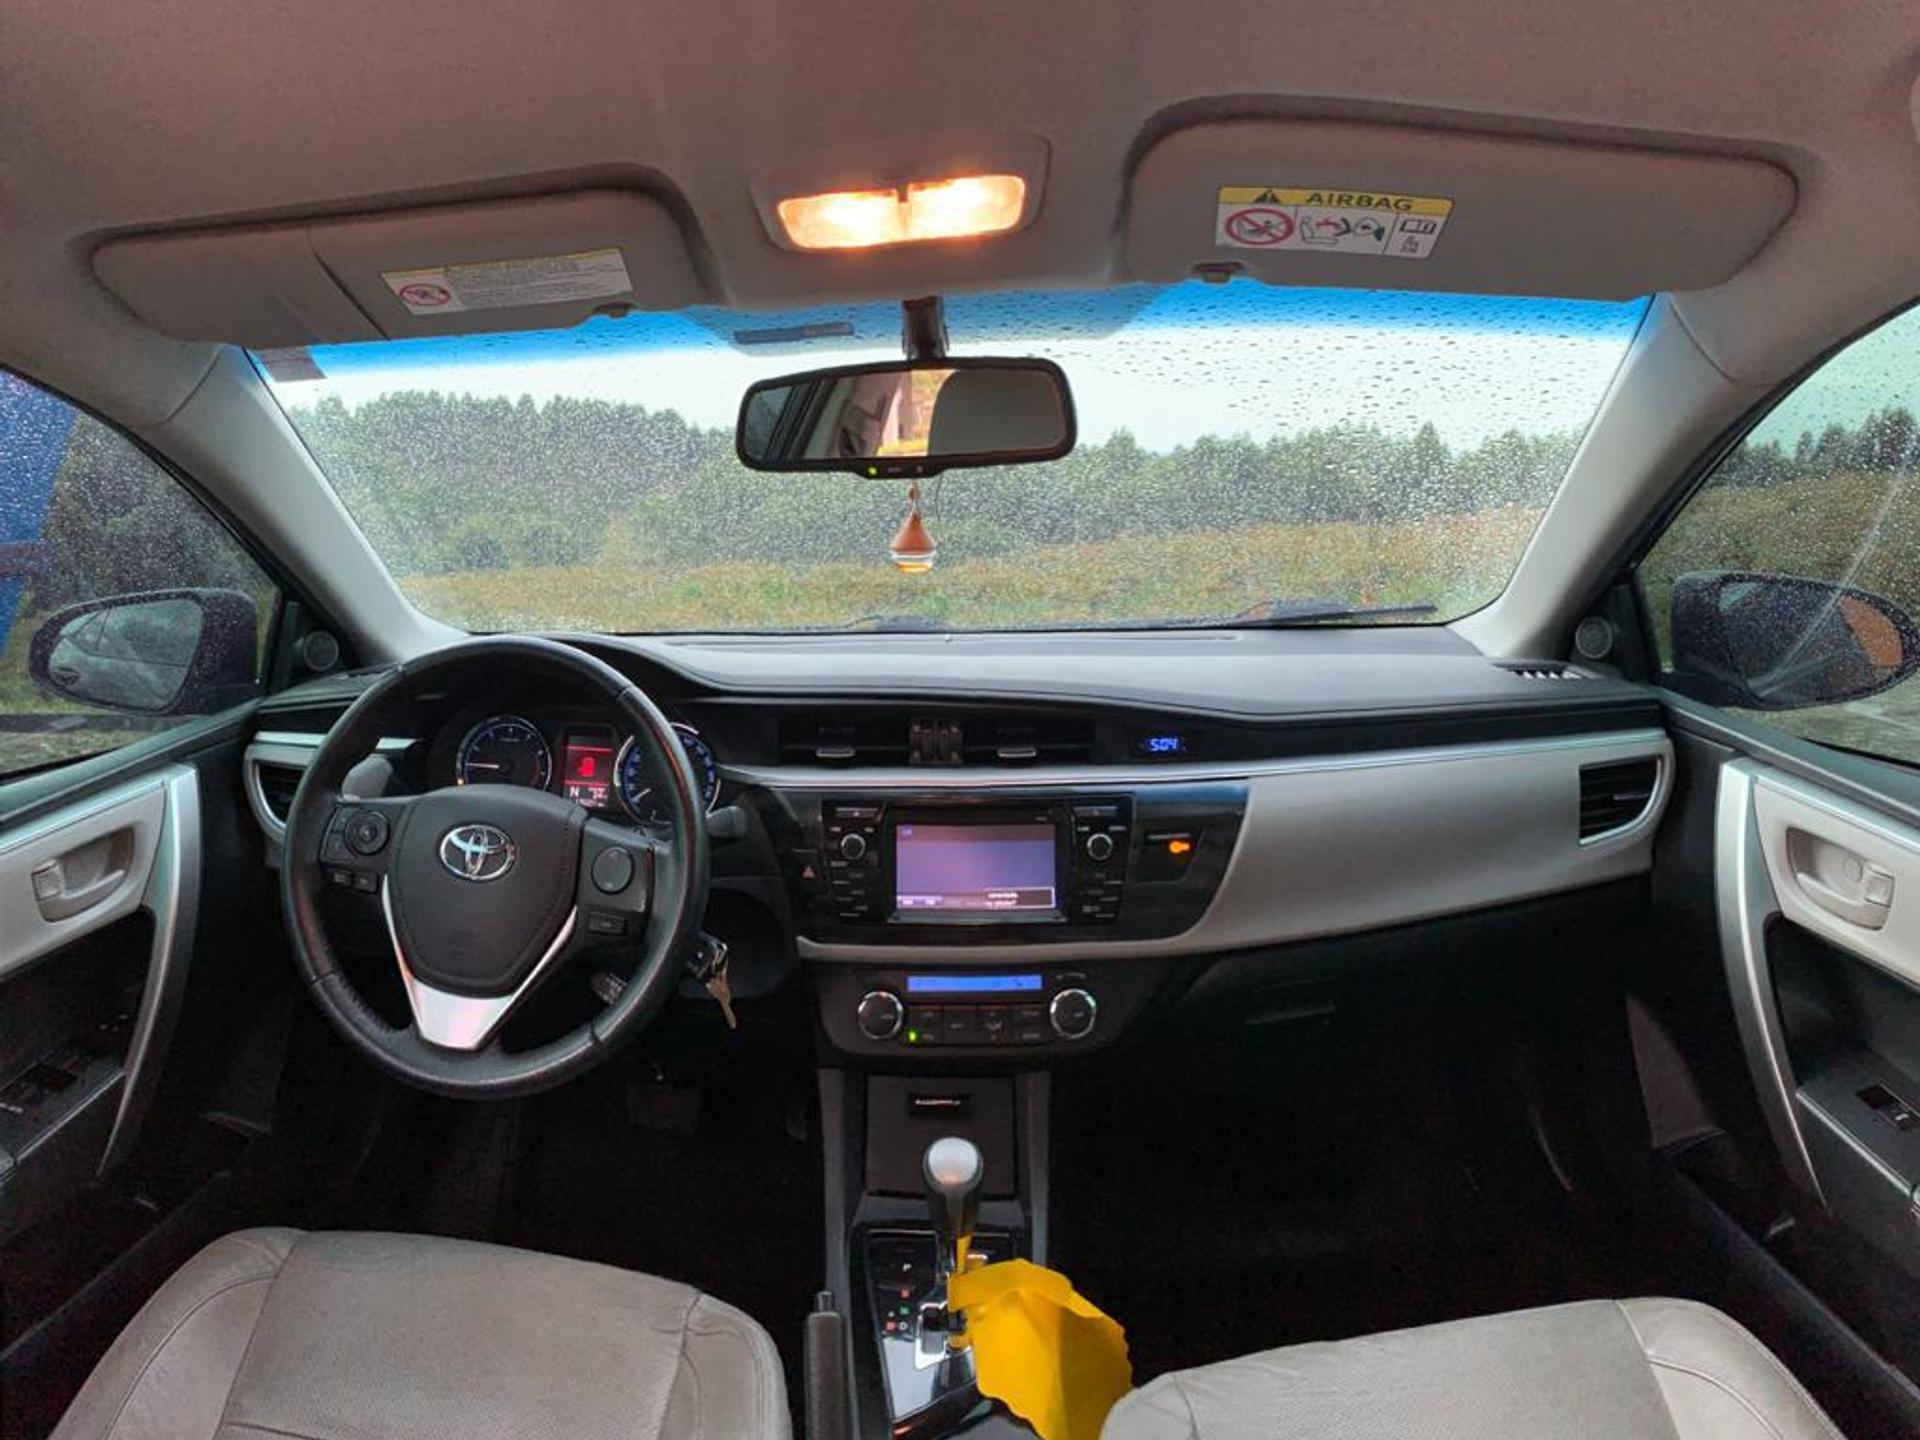 Toyota Corolla 2.0 Xei 16v Flex 4p Automatico Wmimagem08230840235